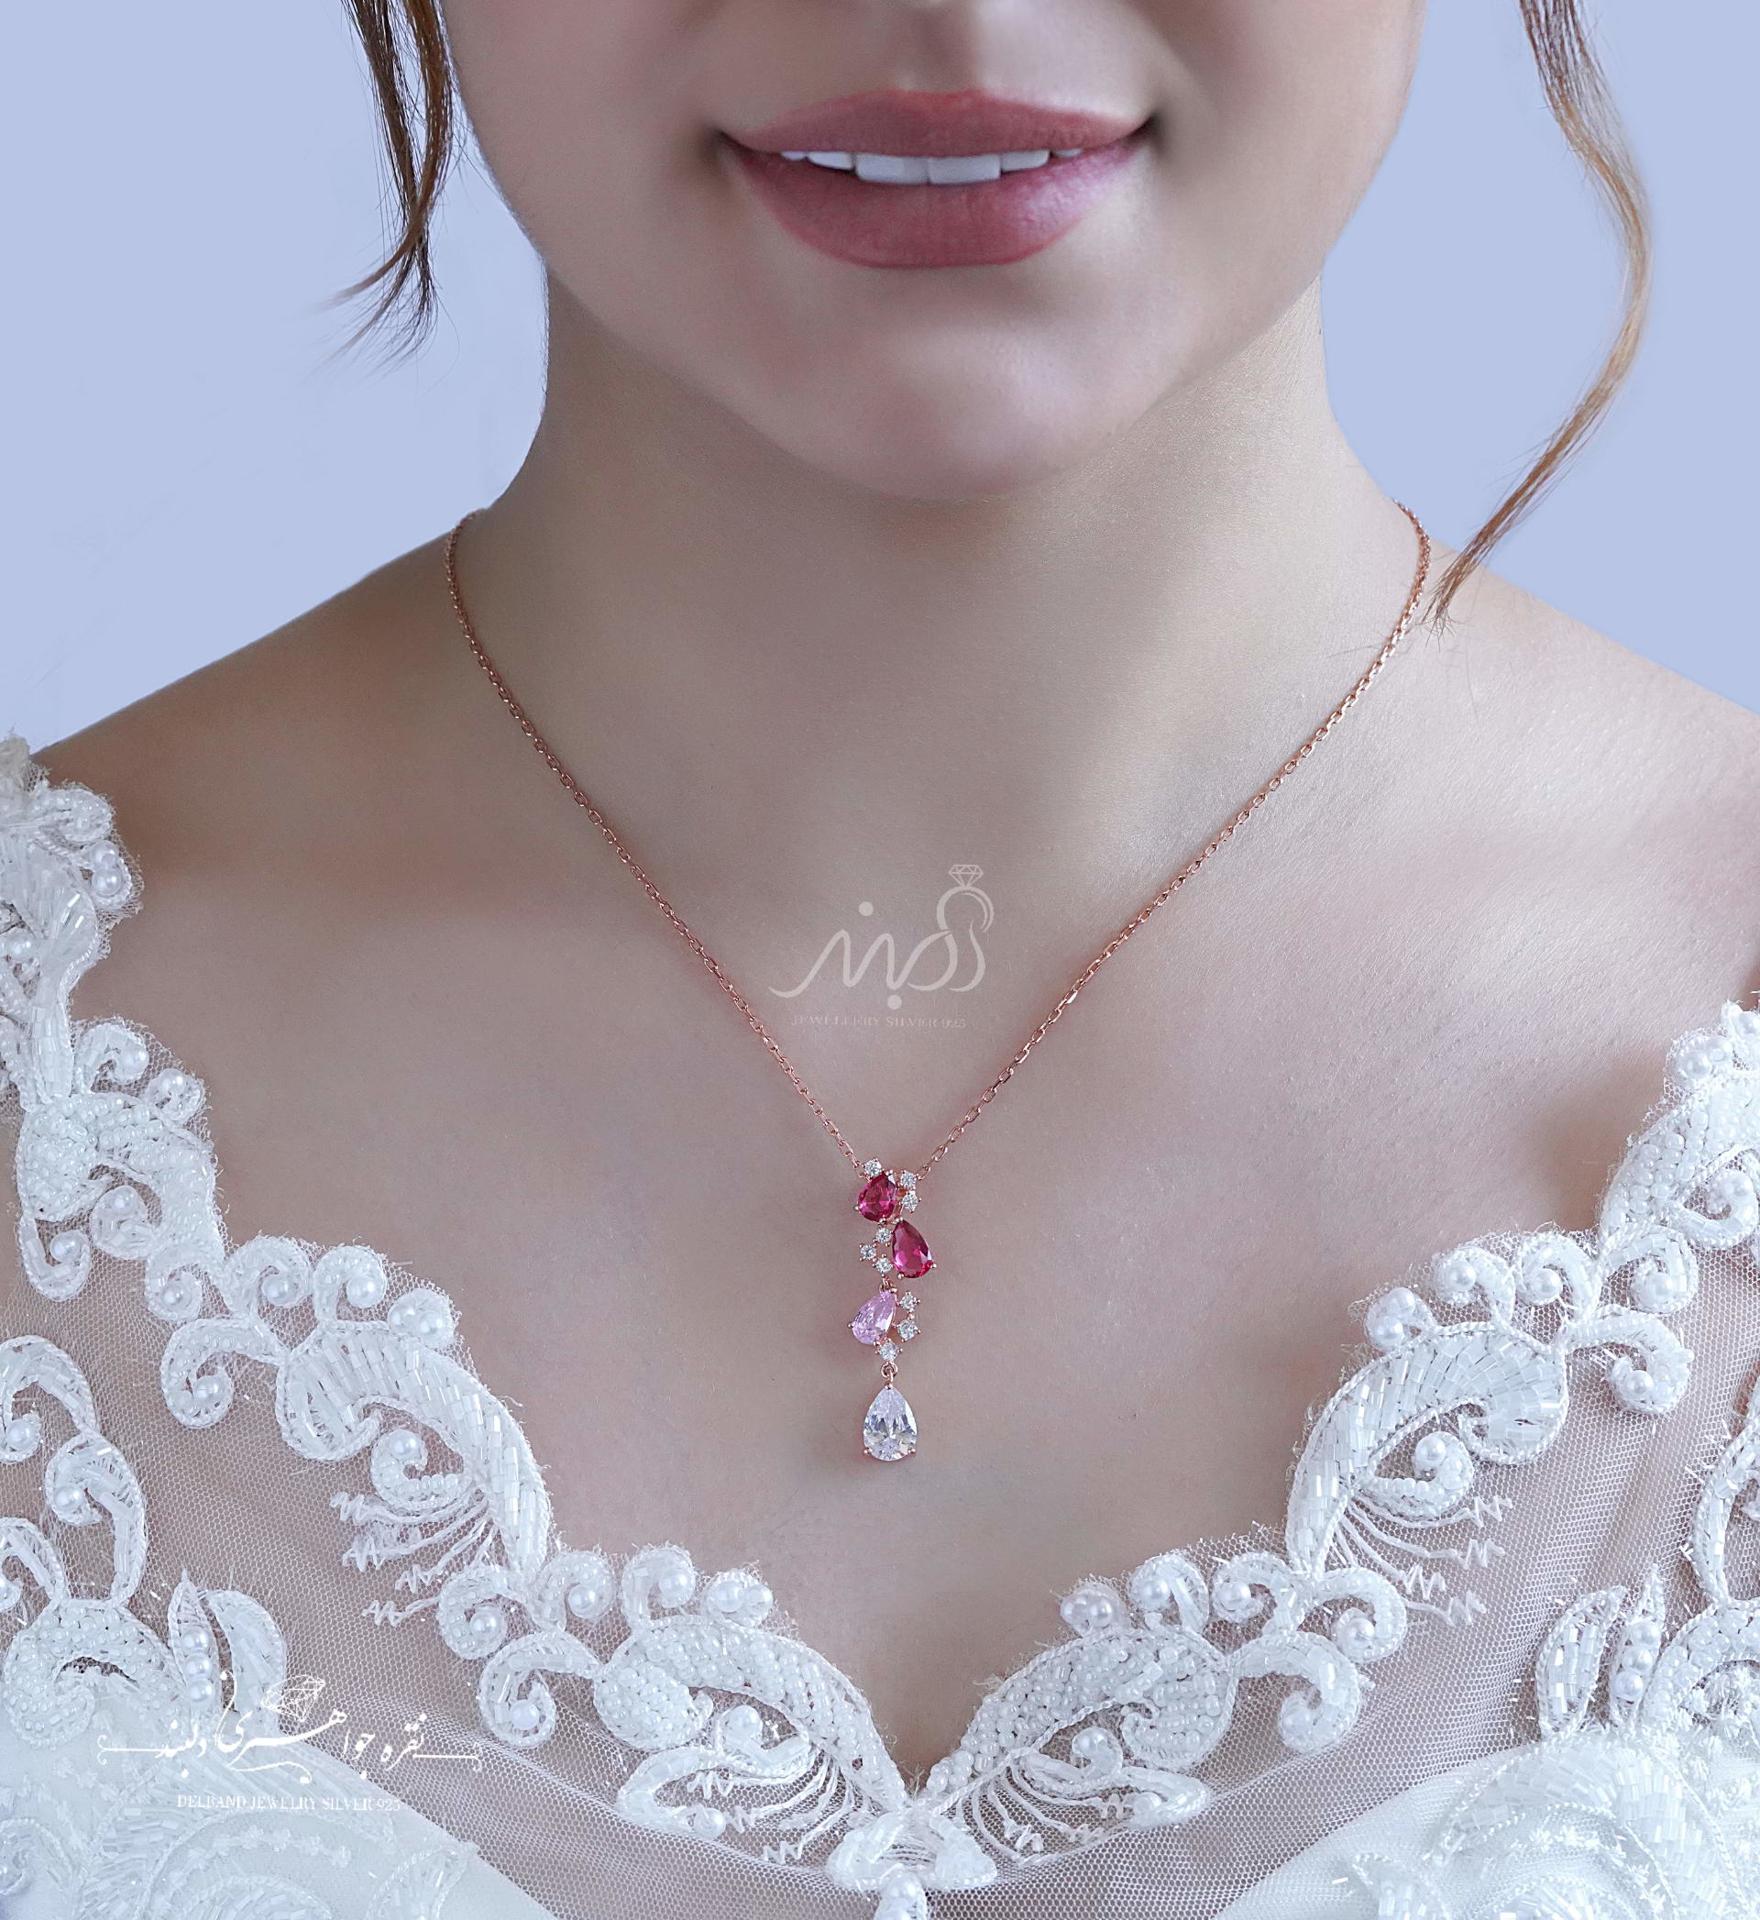 💍نیم ست جواهری لوكس رزگلد؛ نقره عیار ۹۲۵(N_4131)